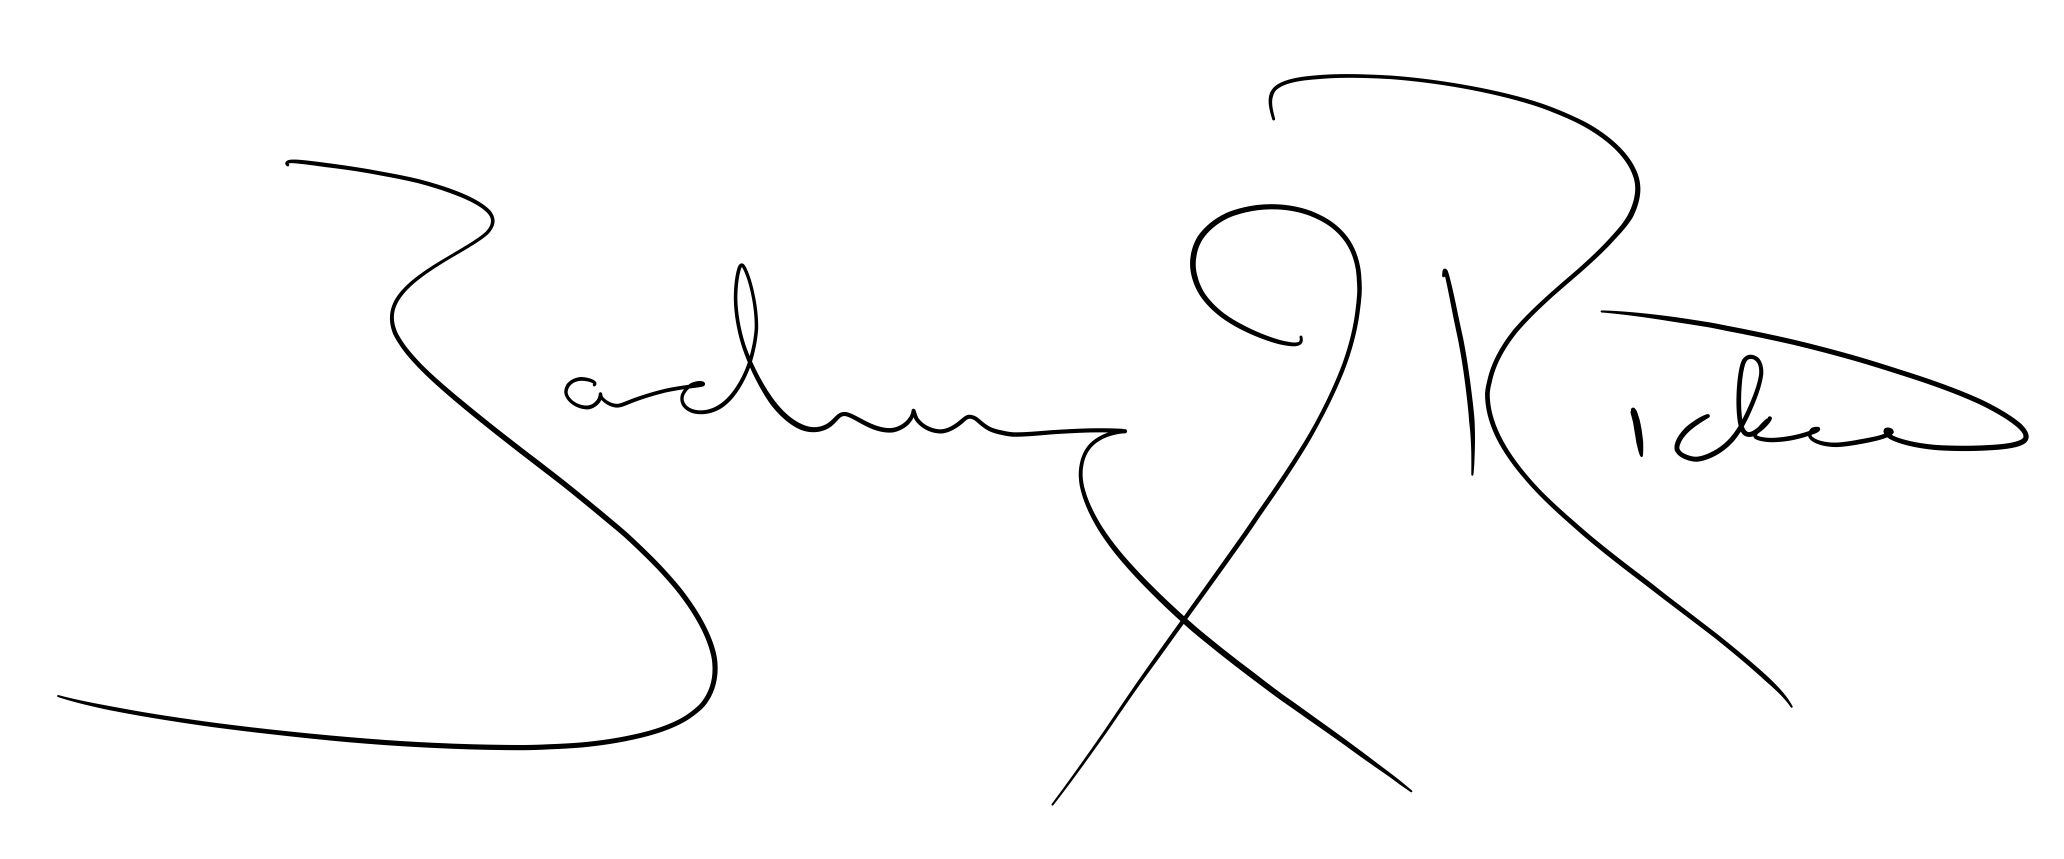 Signature 2018.png